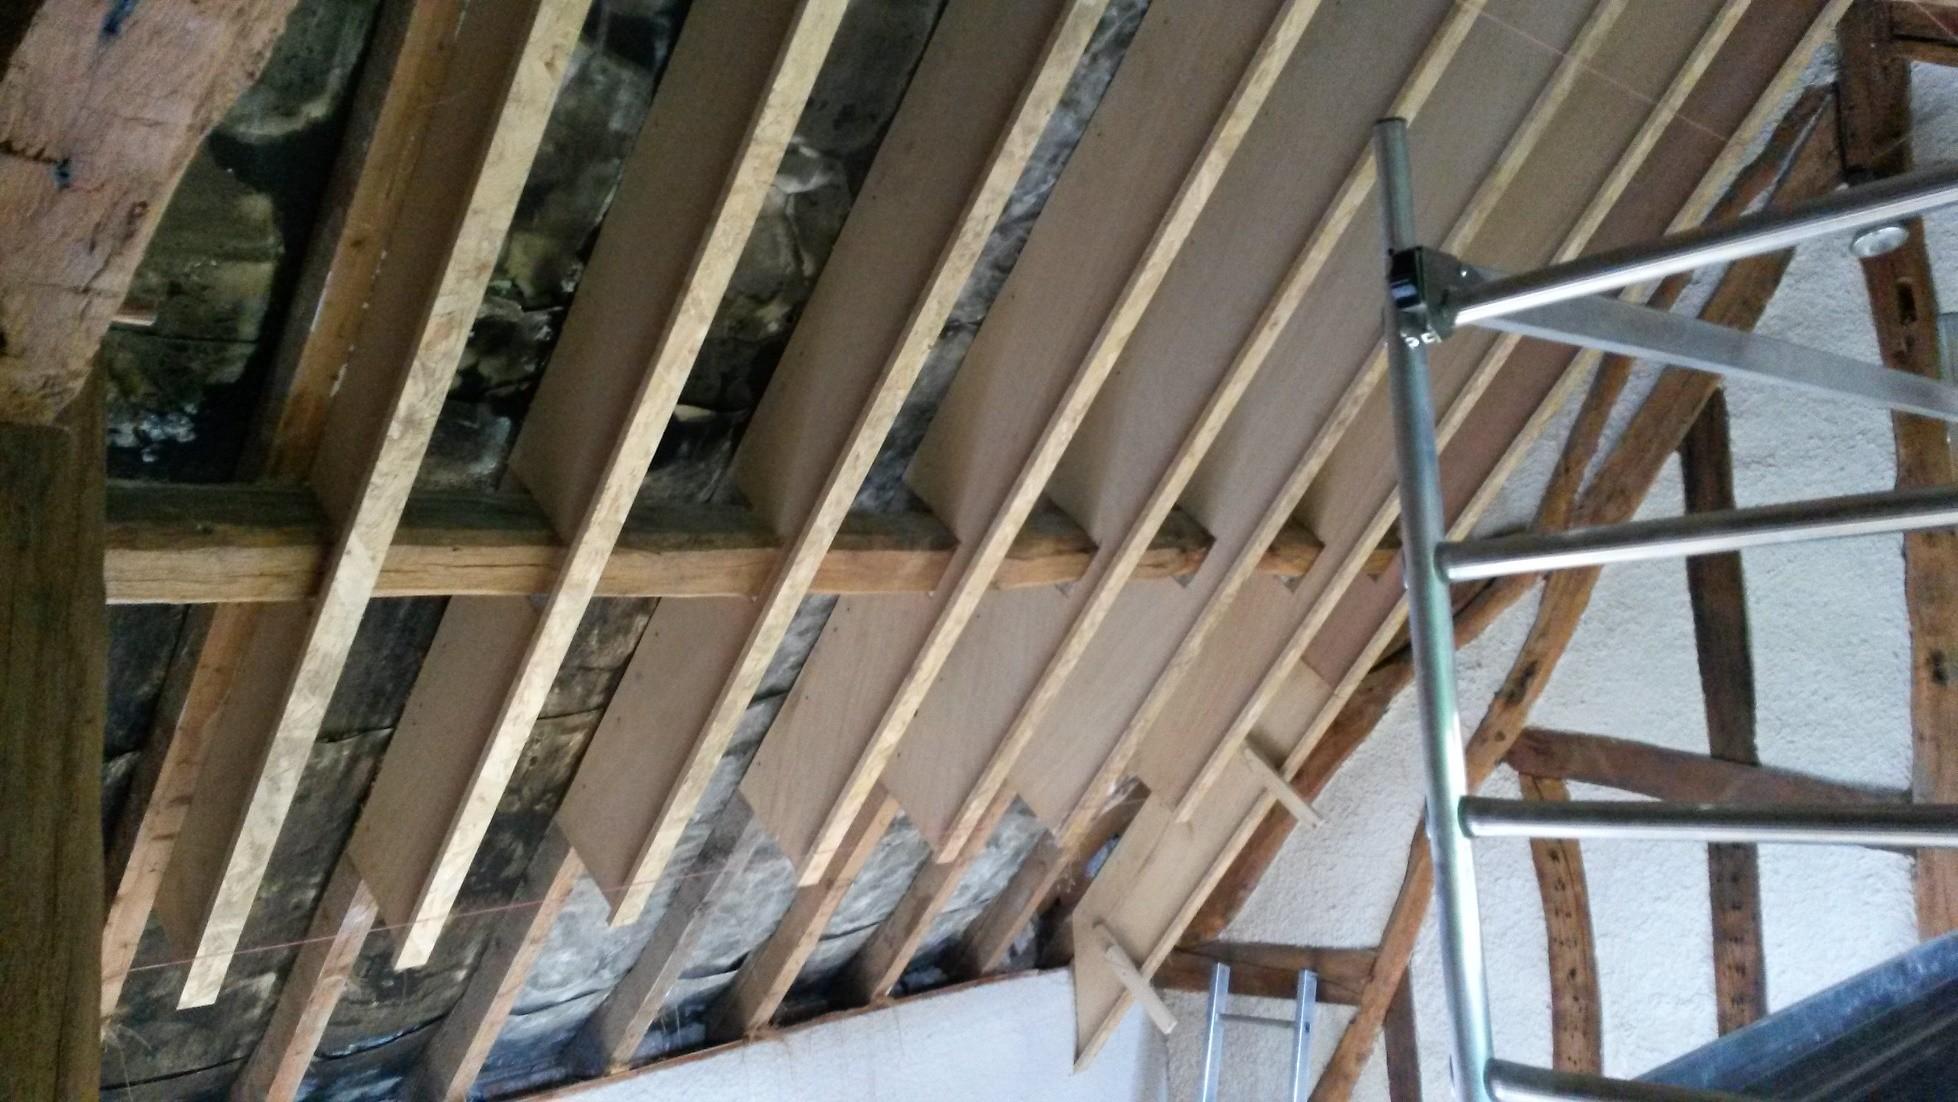 isolation de toiture en ouate de cellulose et fermacell. Black Bedroom Furniture Sets. Home Design Ideas